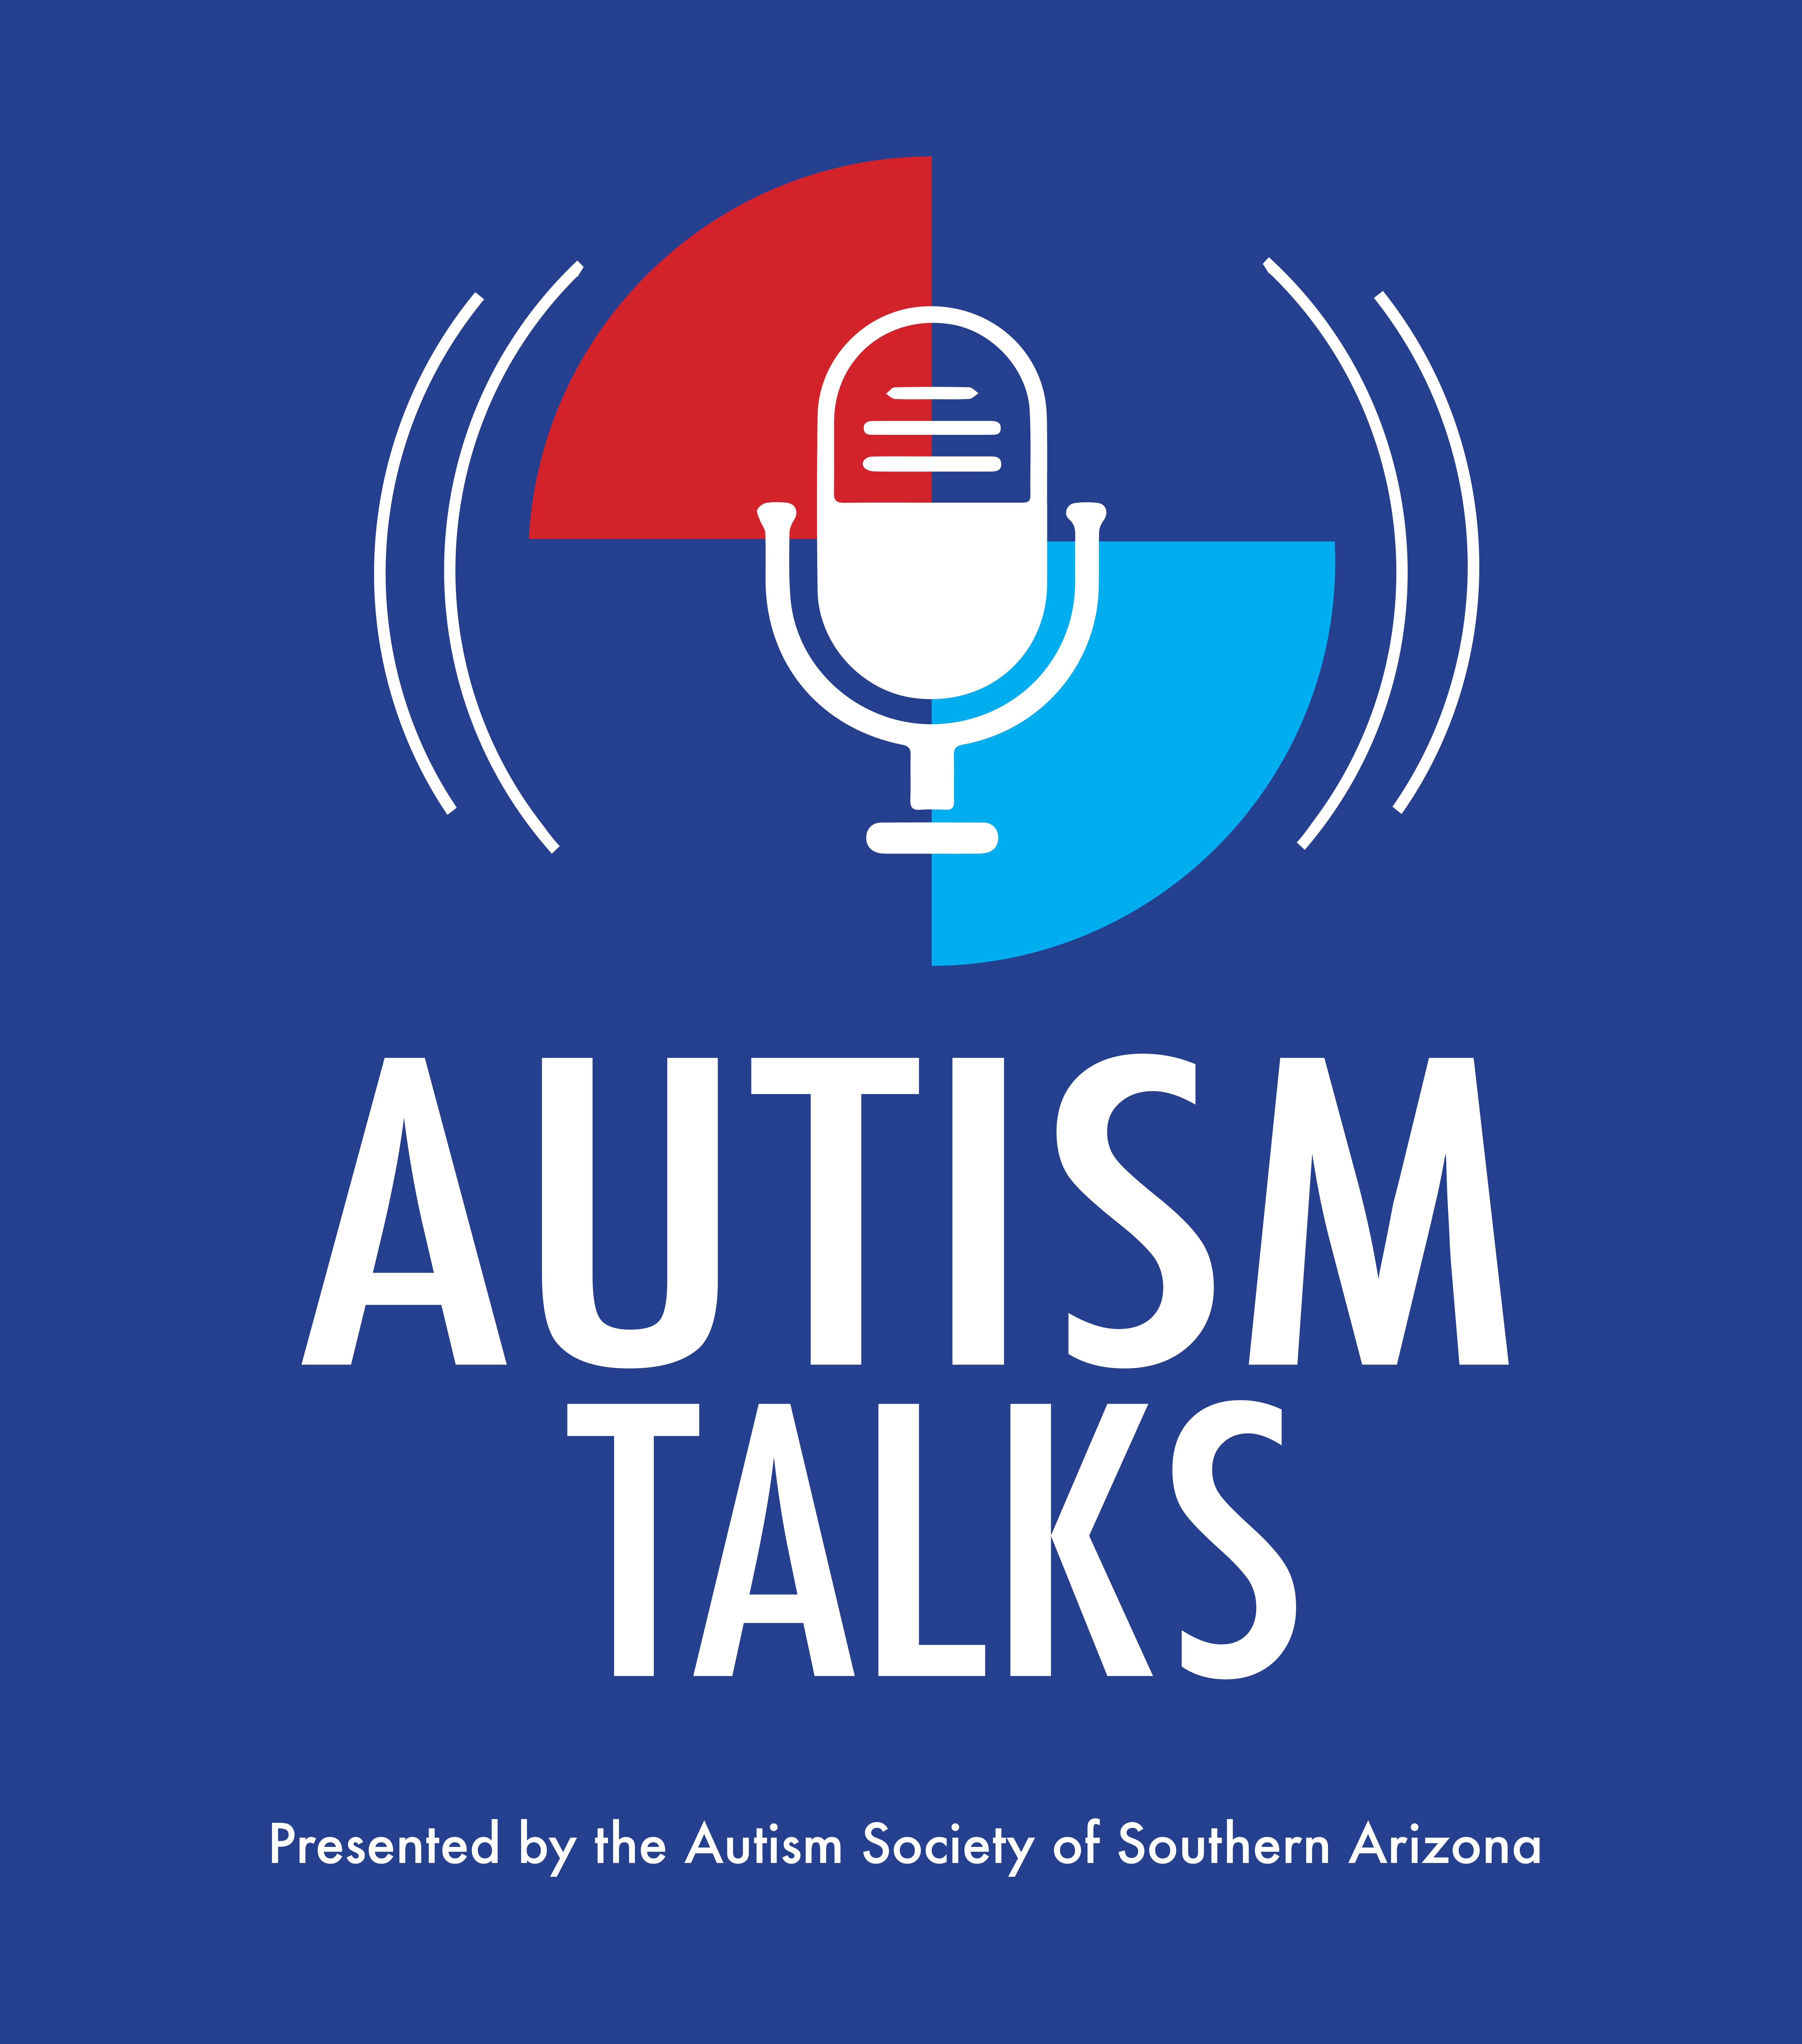 assa autism talks logo unsized